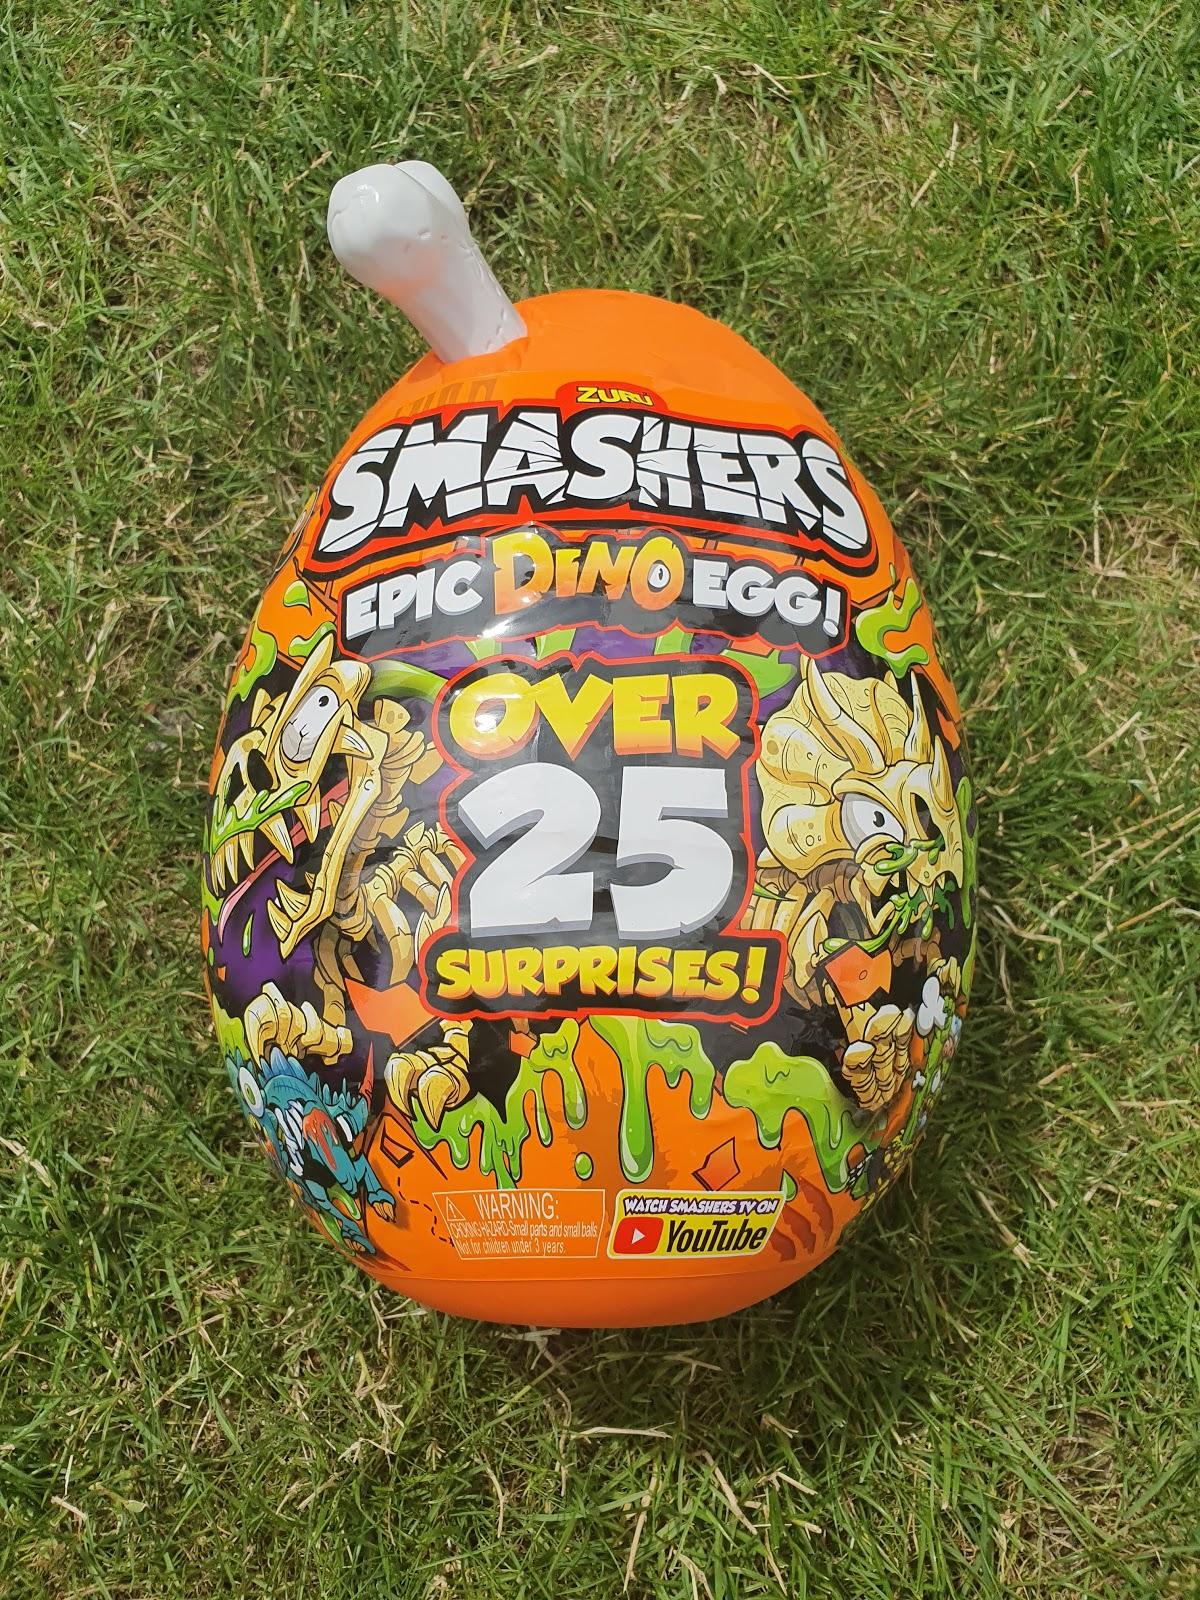 Zuru Smashers EpIc Dino Egg Over 25 Surprises New Factory Sealed 2019 Series 3